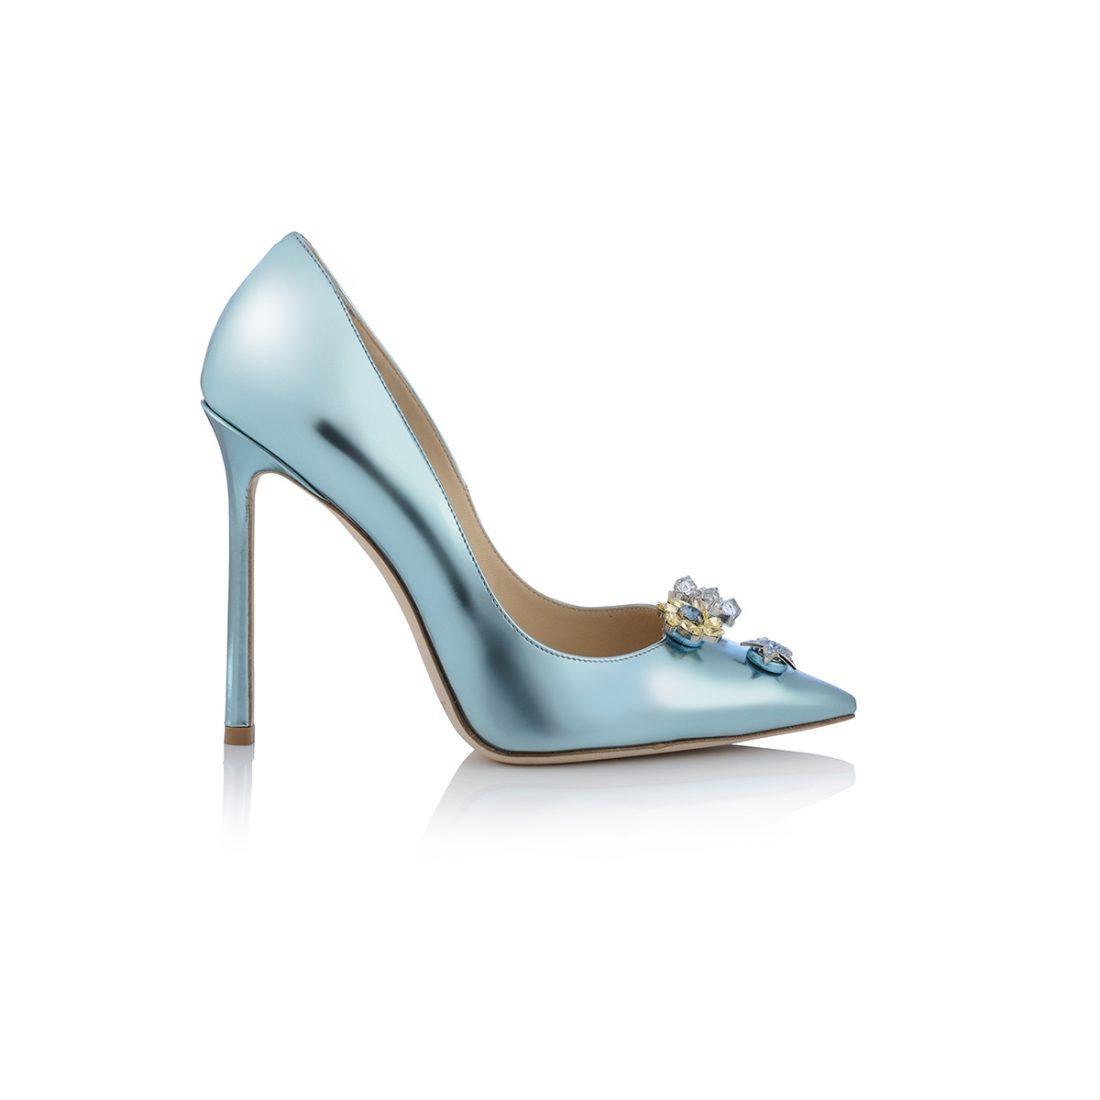 'Jasmine' Heel